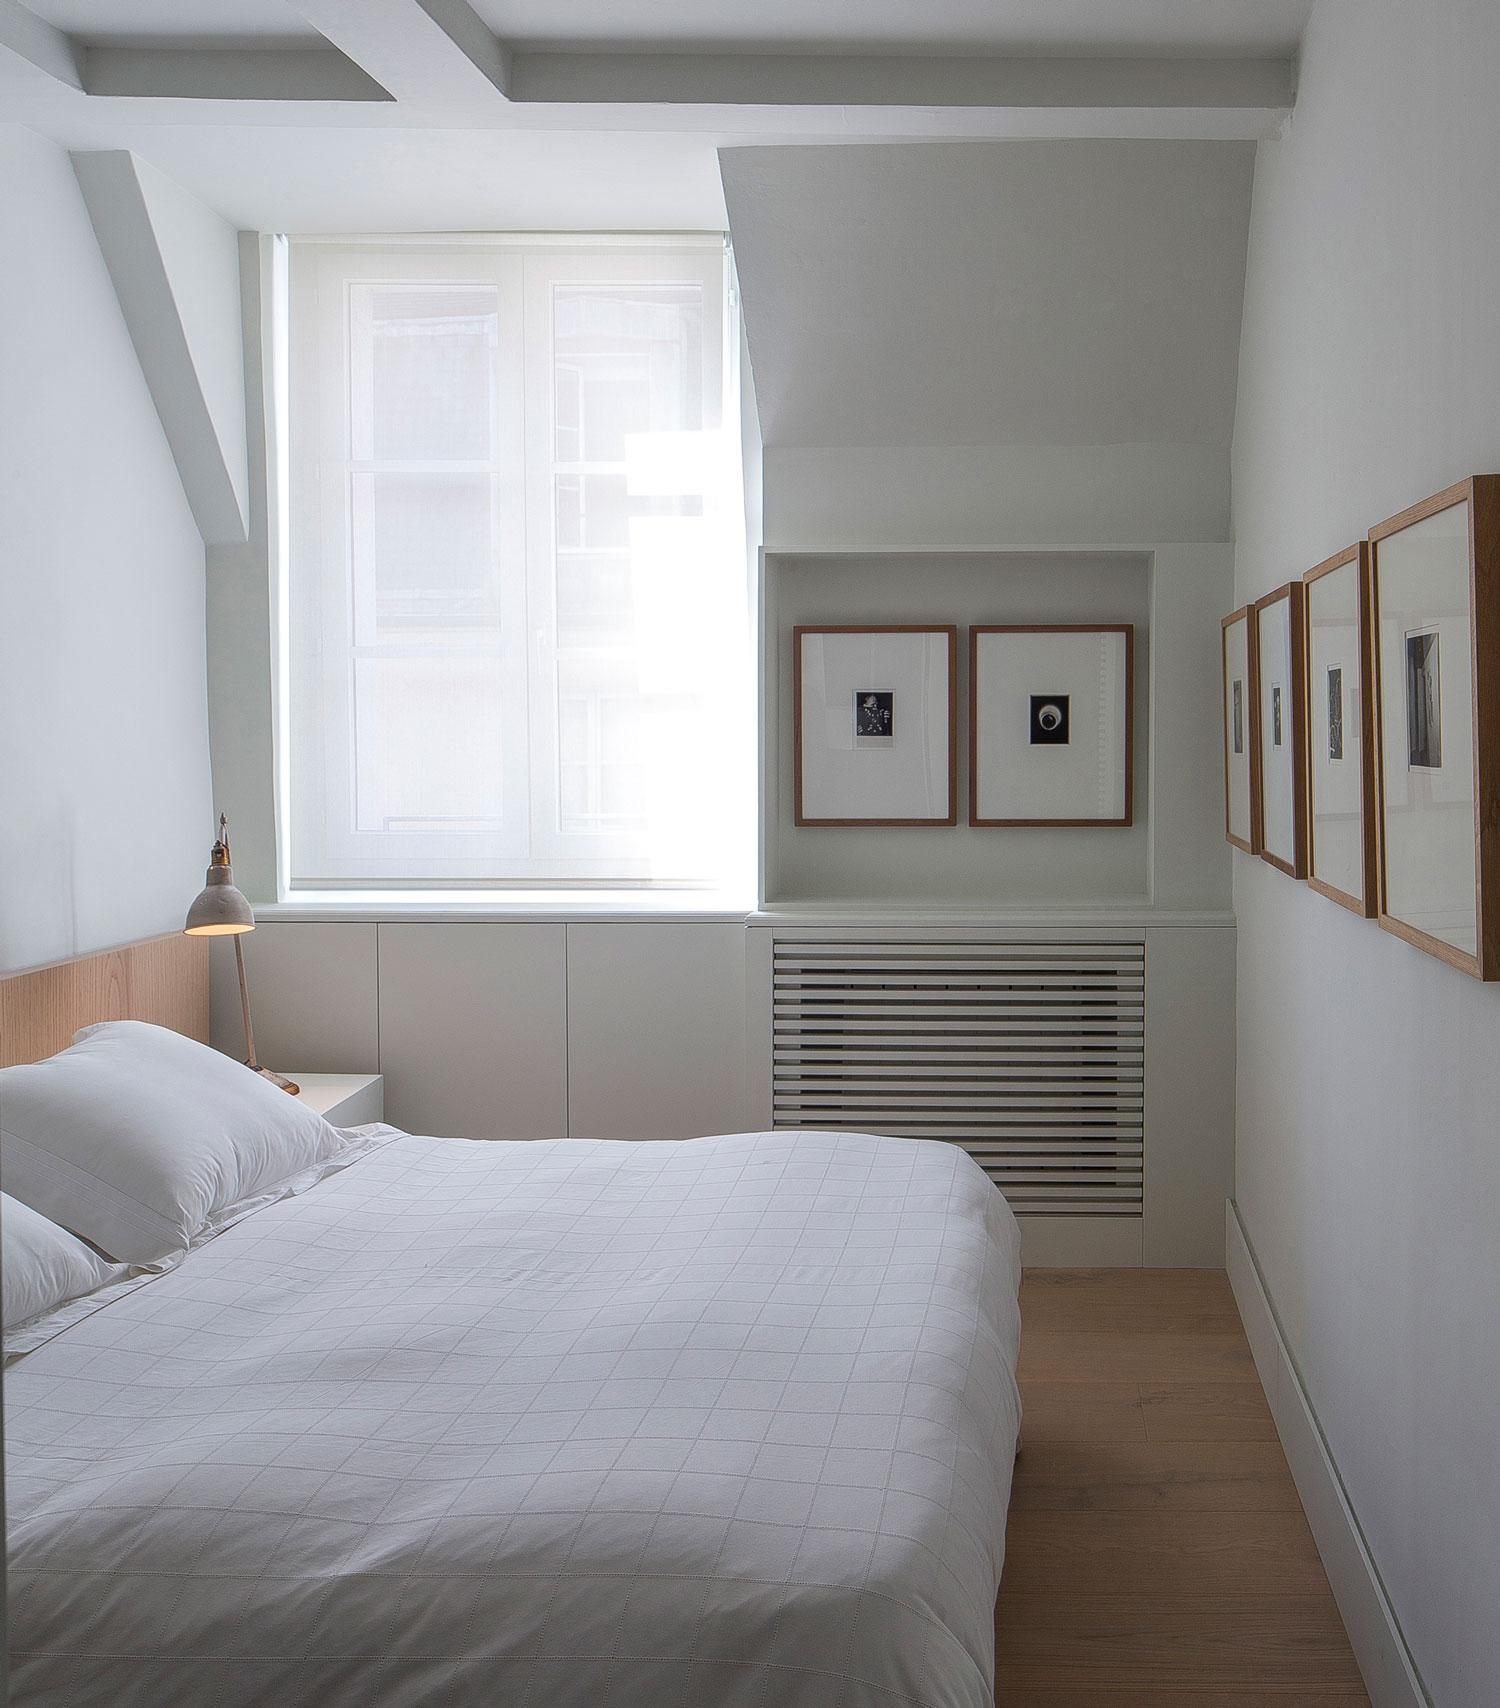 Apartment in Paris by Francesc Rife Studio   Yellowtrace